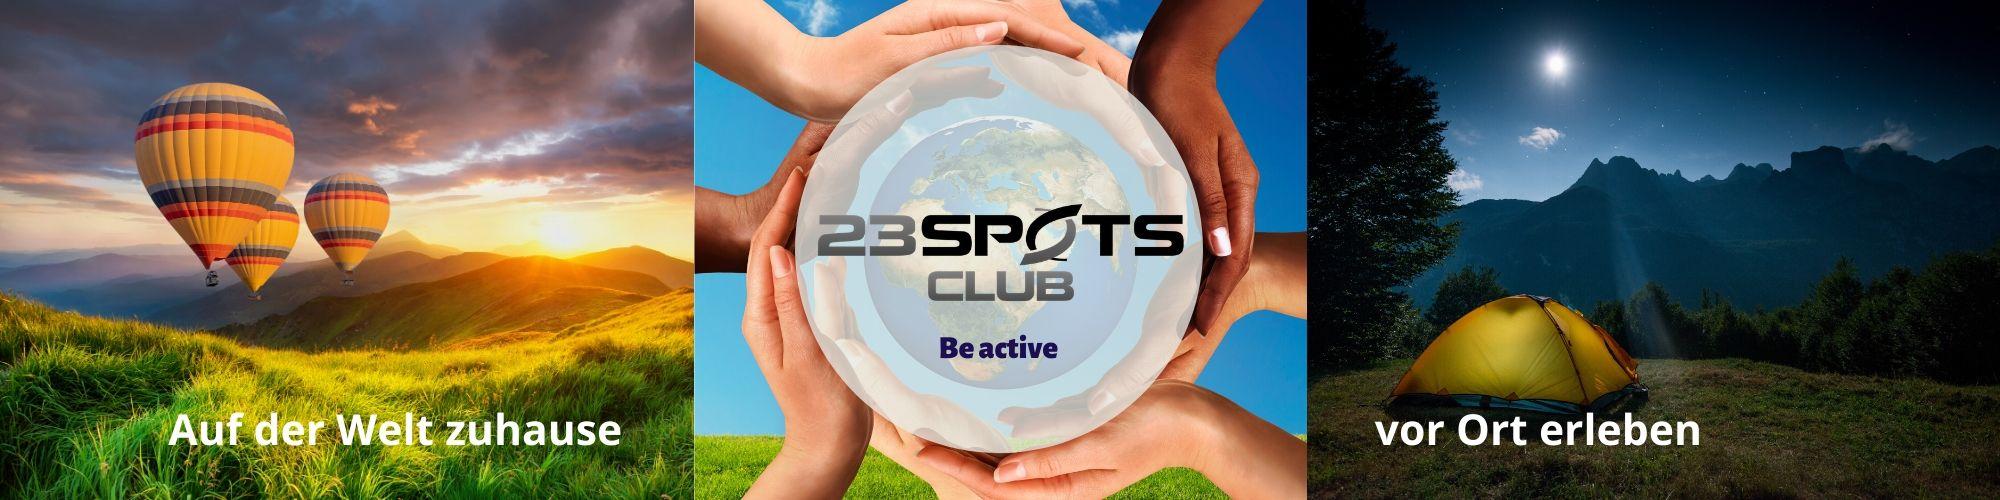 23Spots - Erlebnis Club